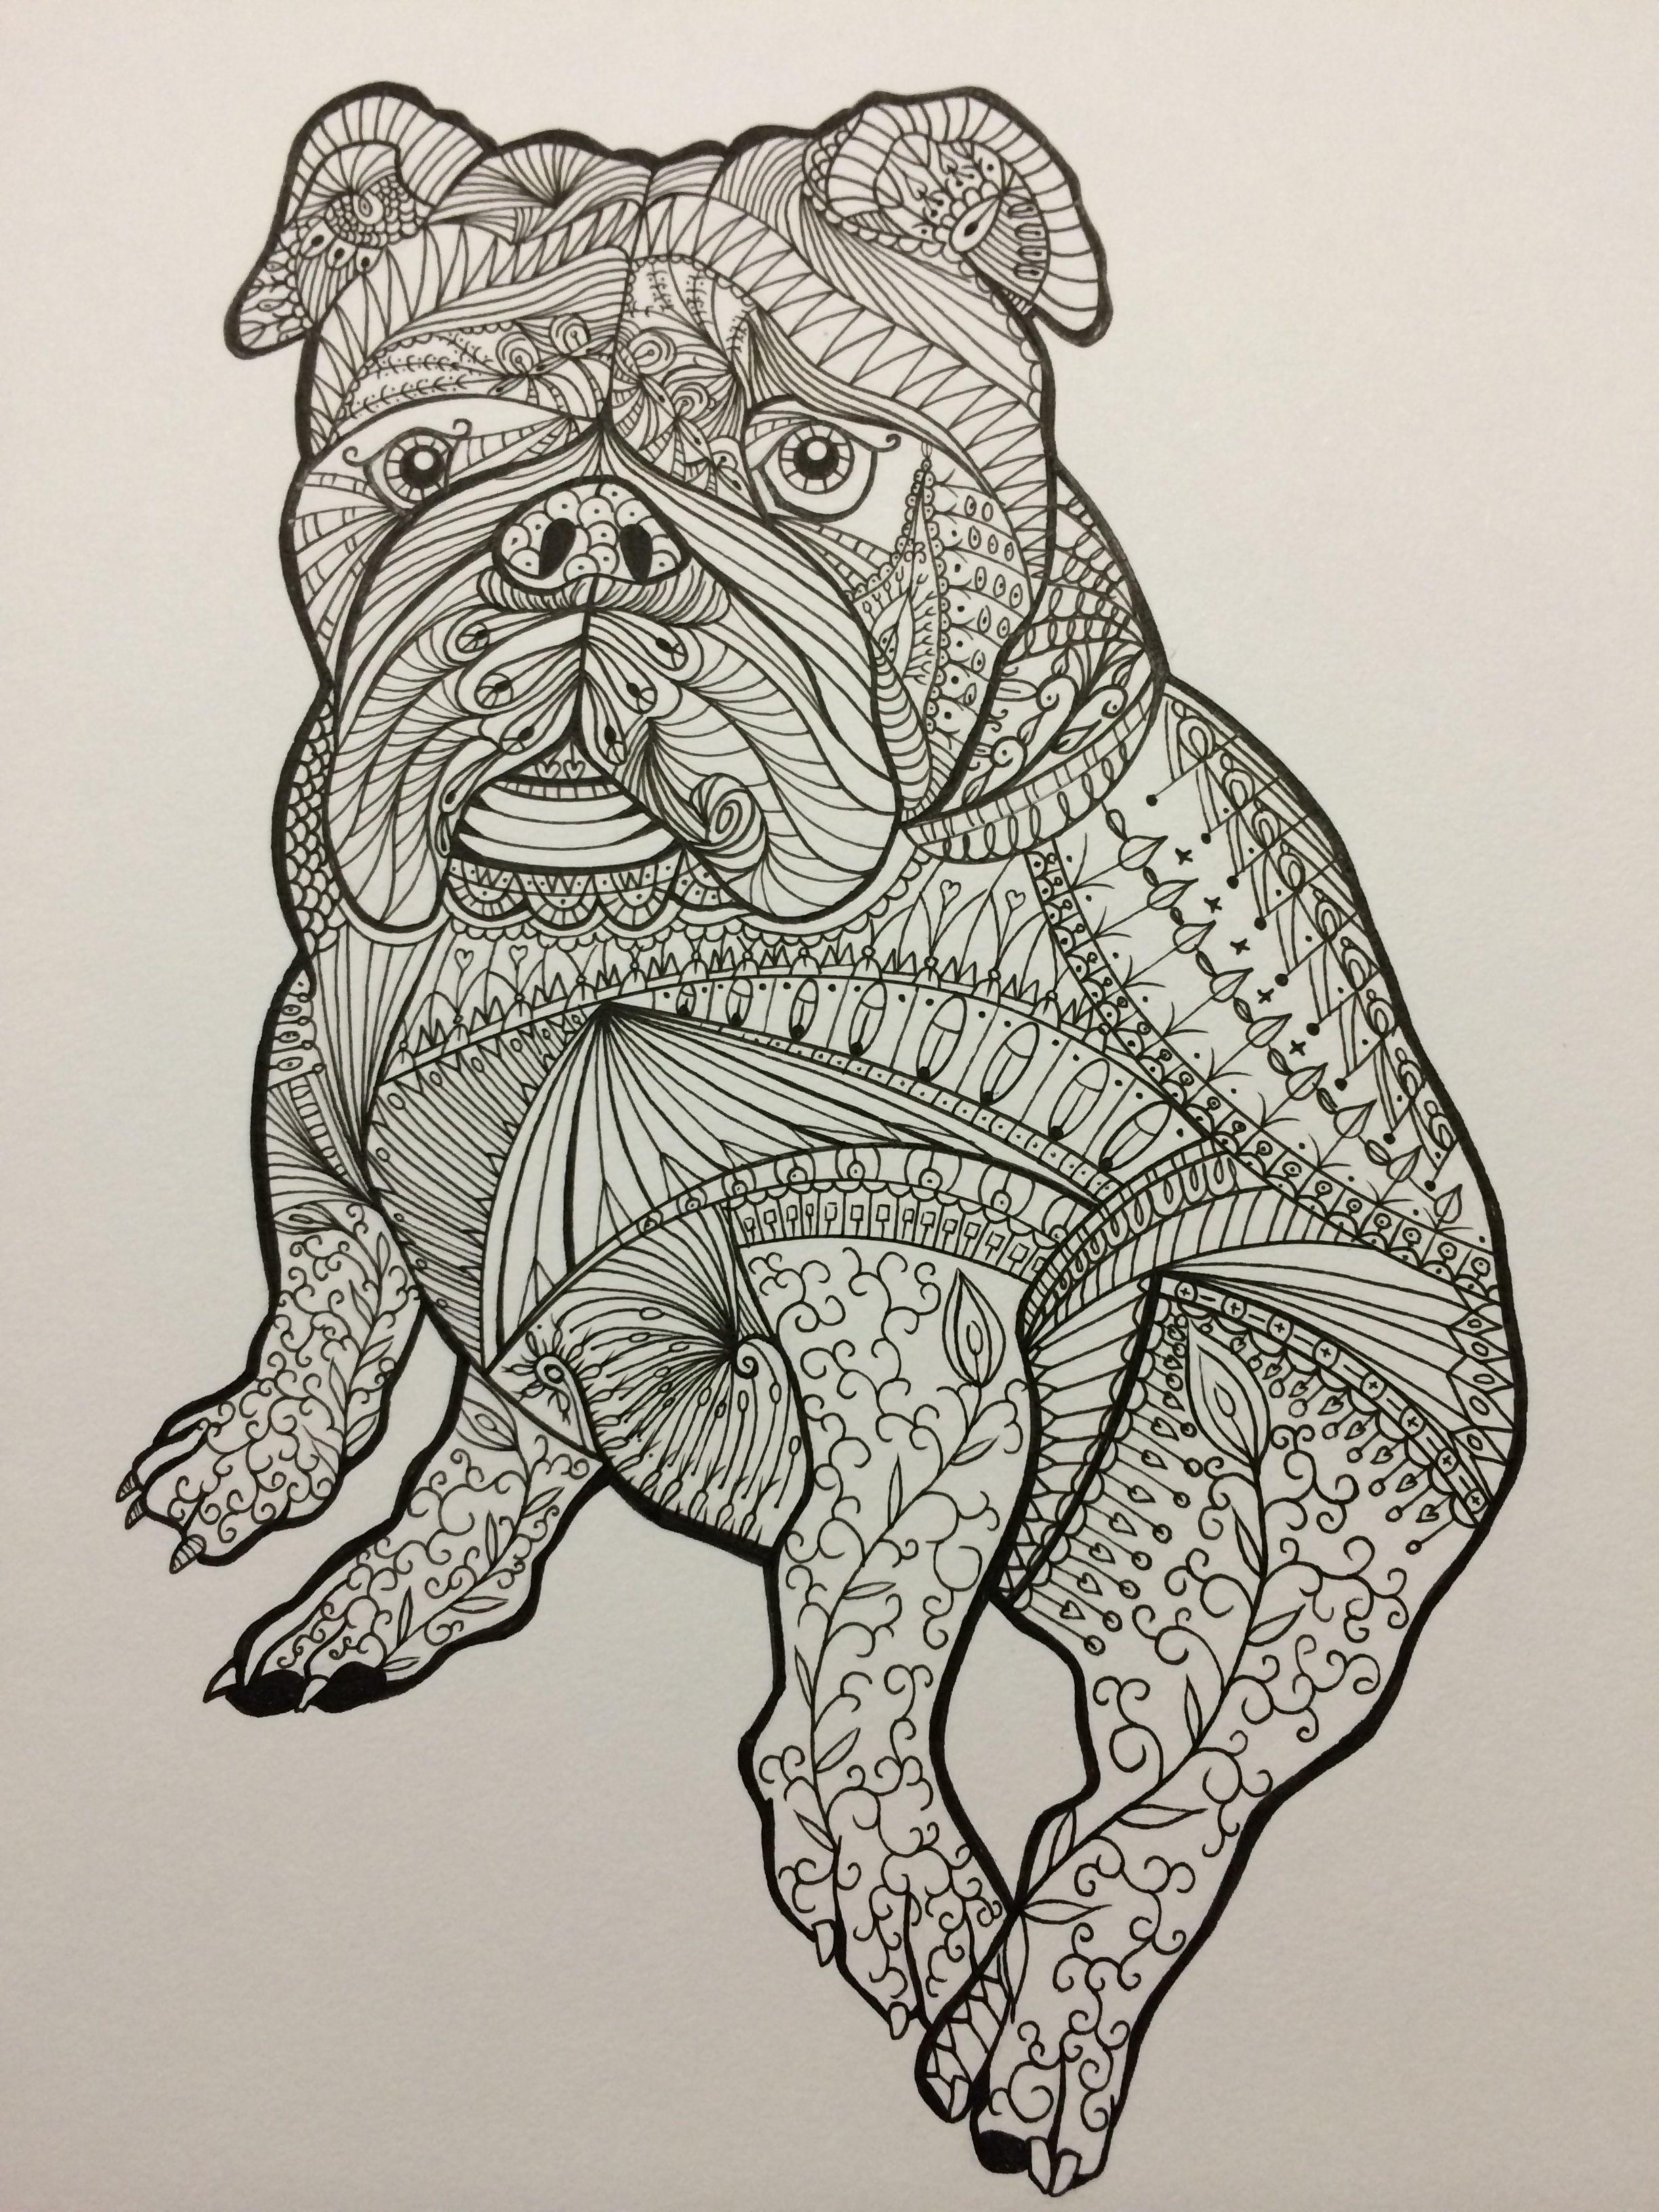 Kleurplaten Engelse Bulldog.I Drew This Zentangle Drawing Of An Englishbulldog